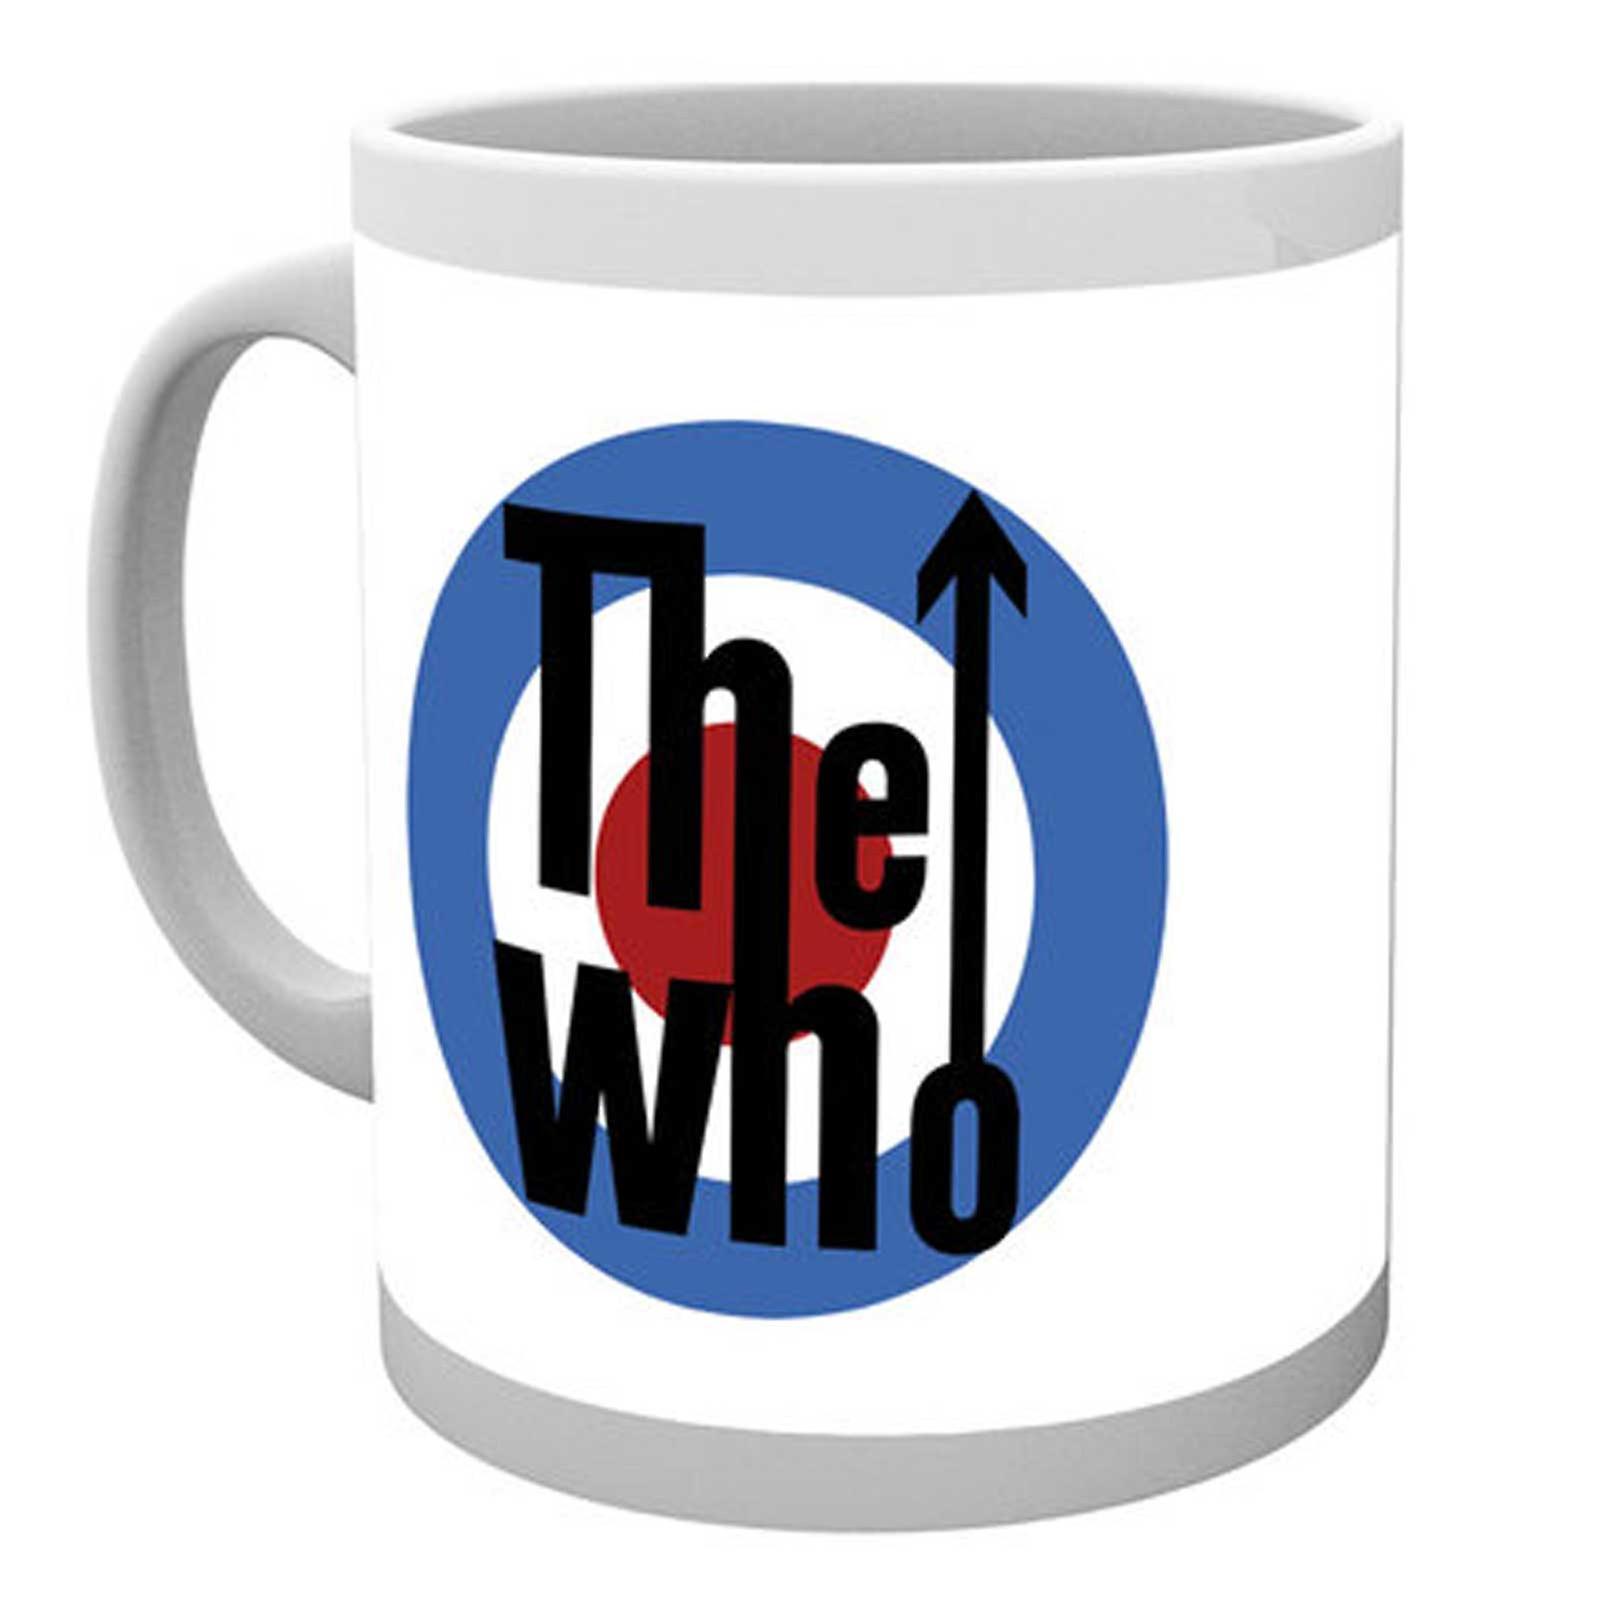 Classic Who Official Band Logo The White Mug Quadrophenia Mod Target New tdQshrC